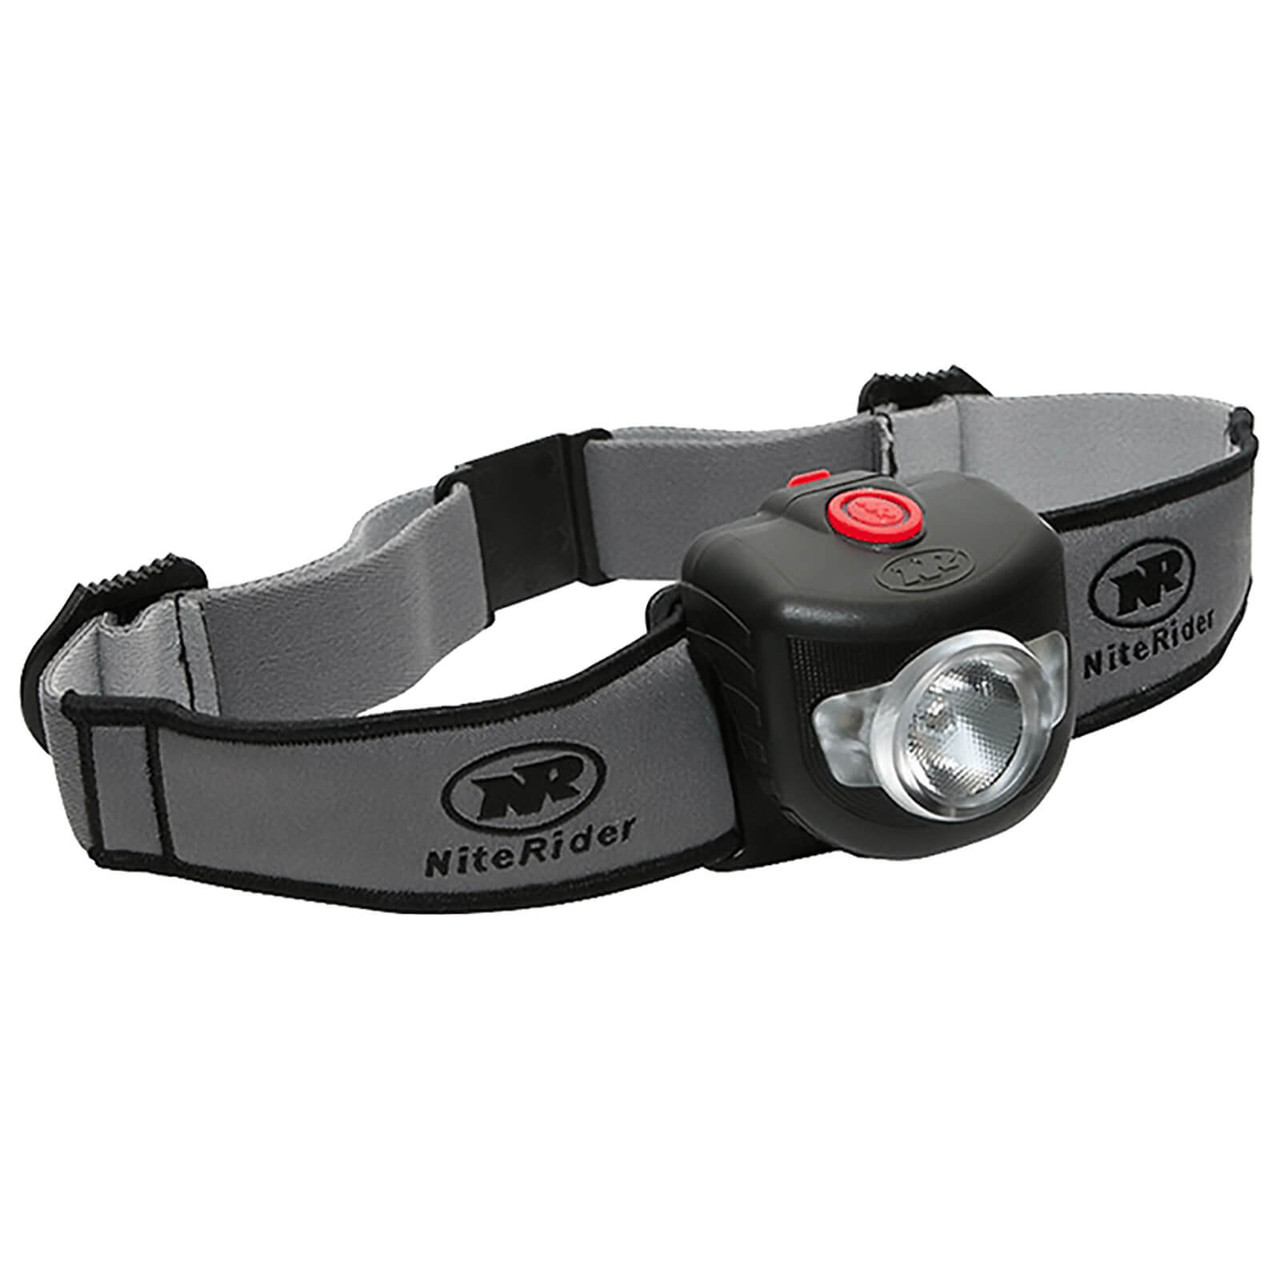 NiteRider Adventure 320 LED Headlight with Strap